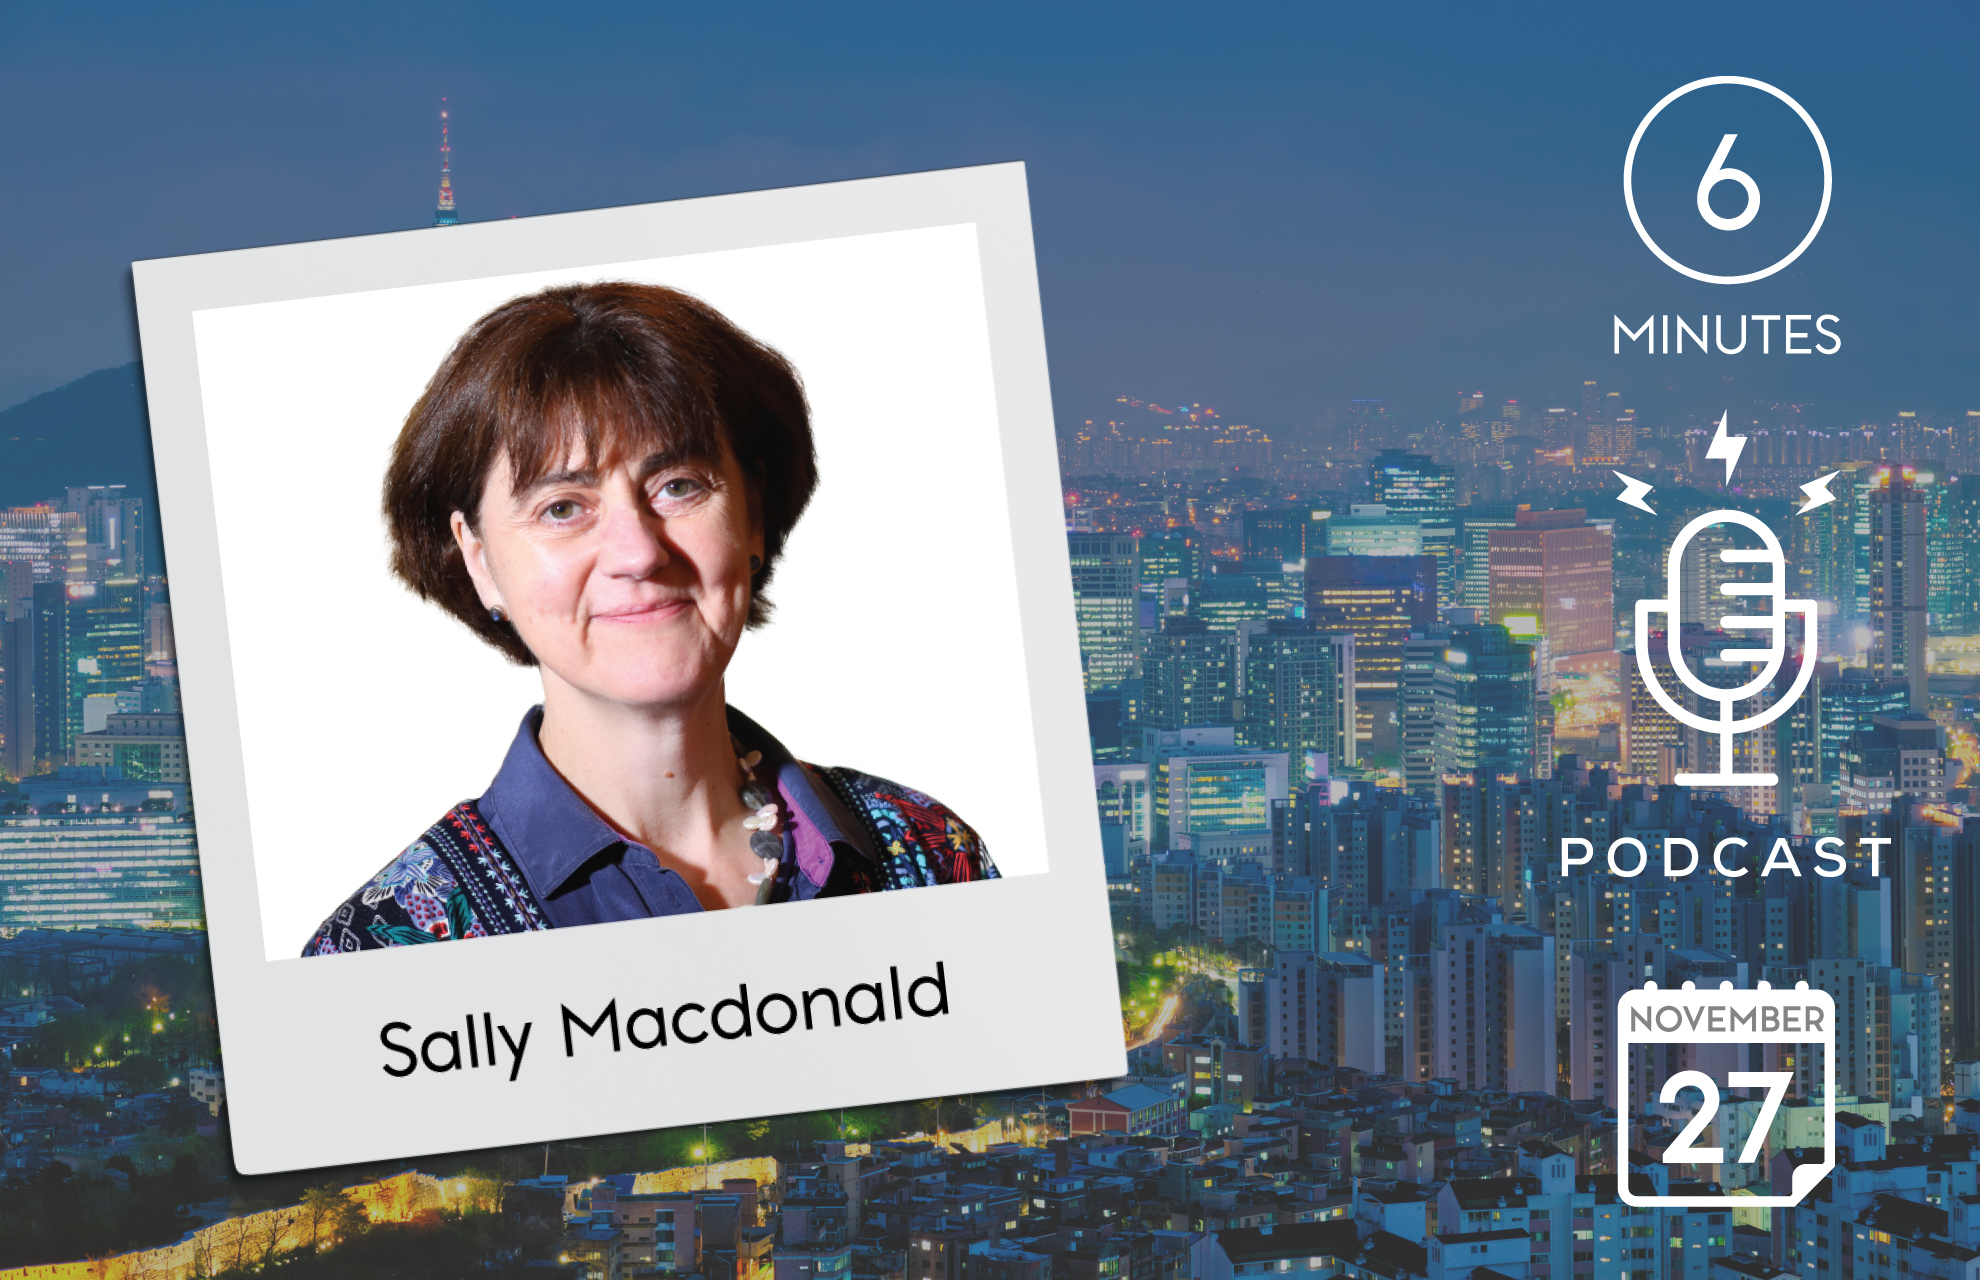 Sally Macdonald podcast